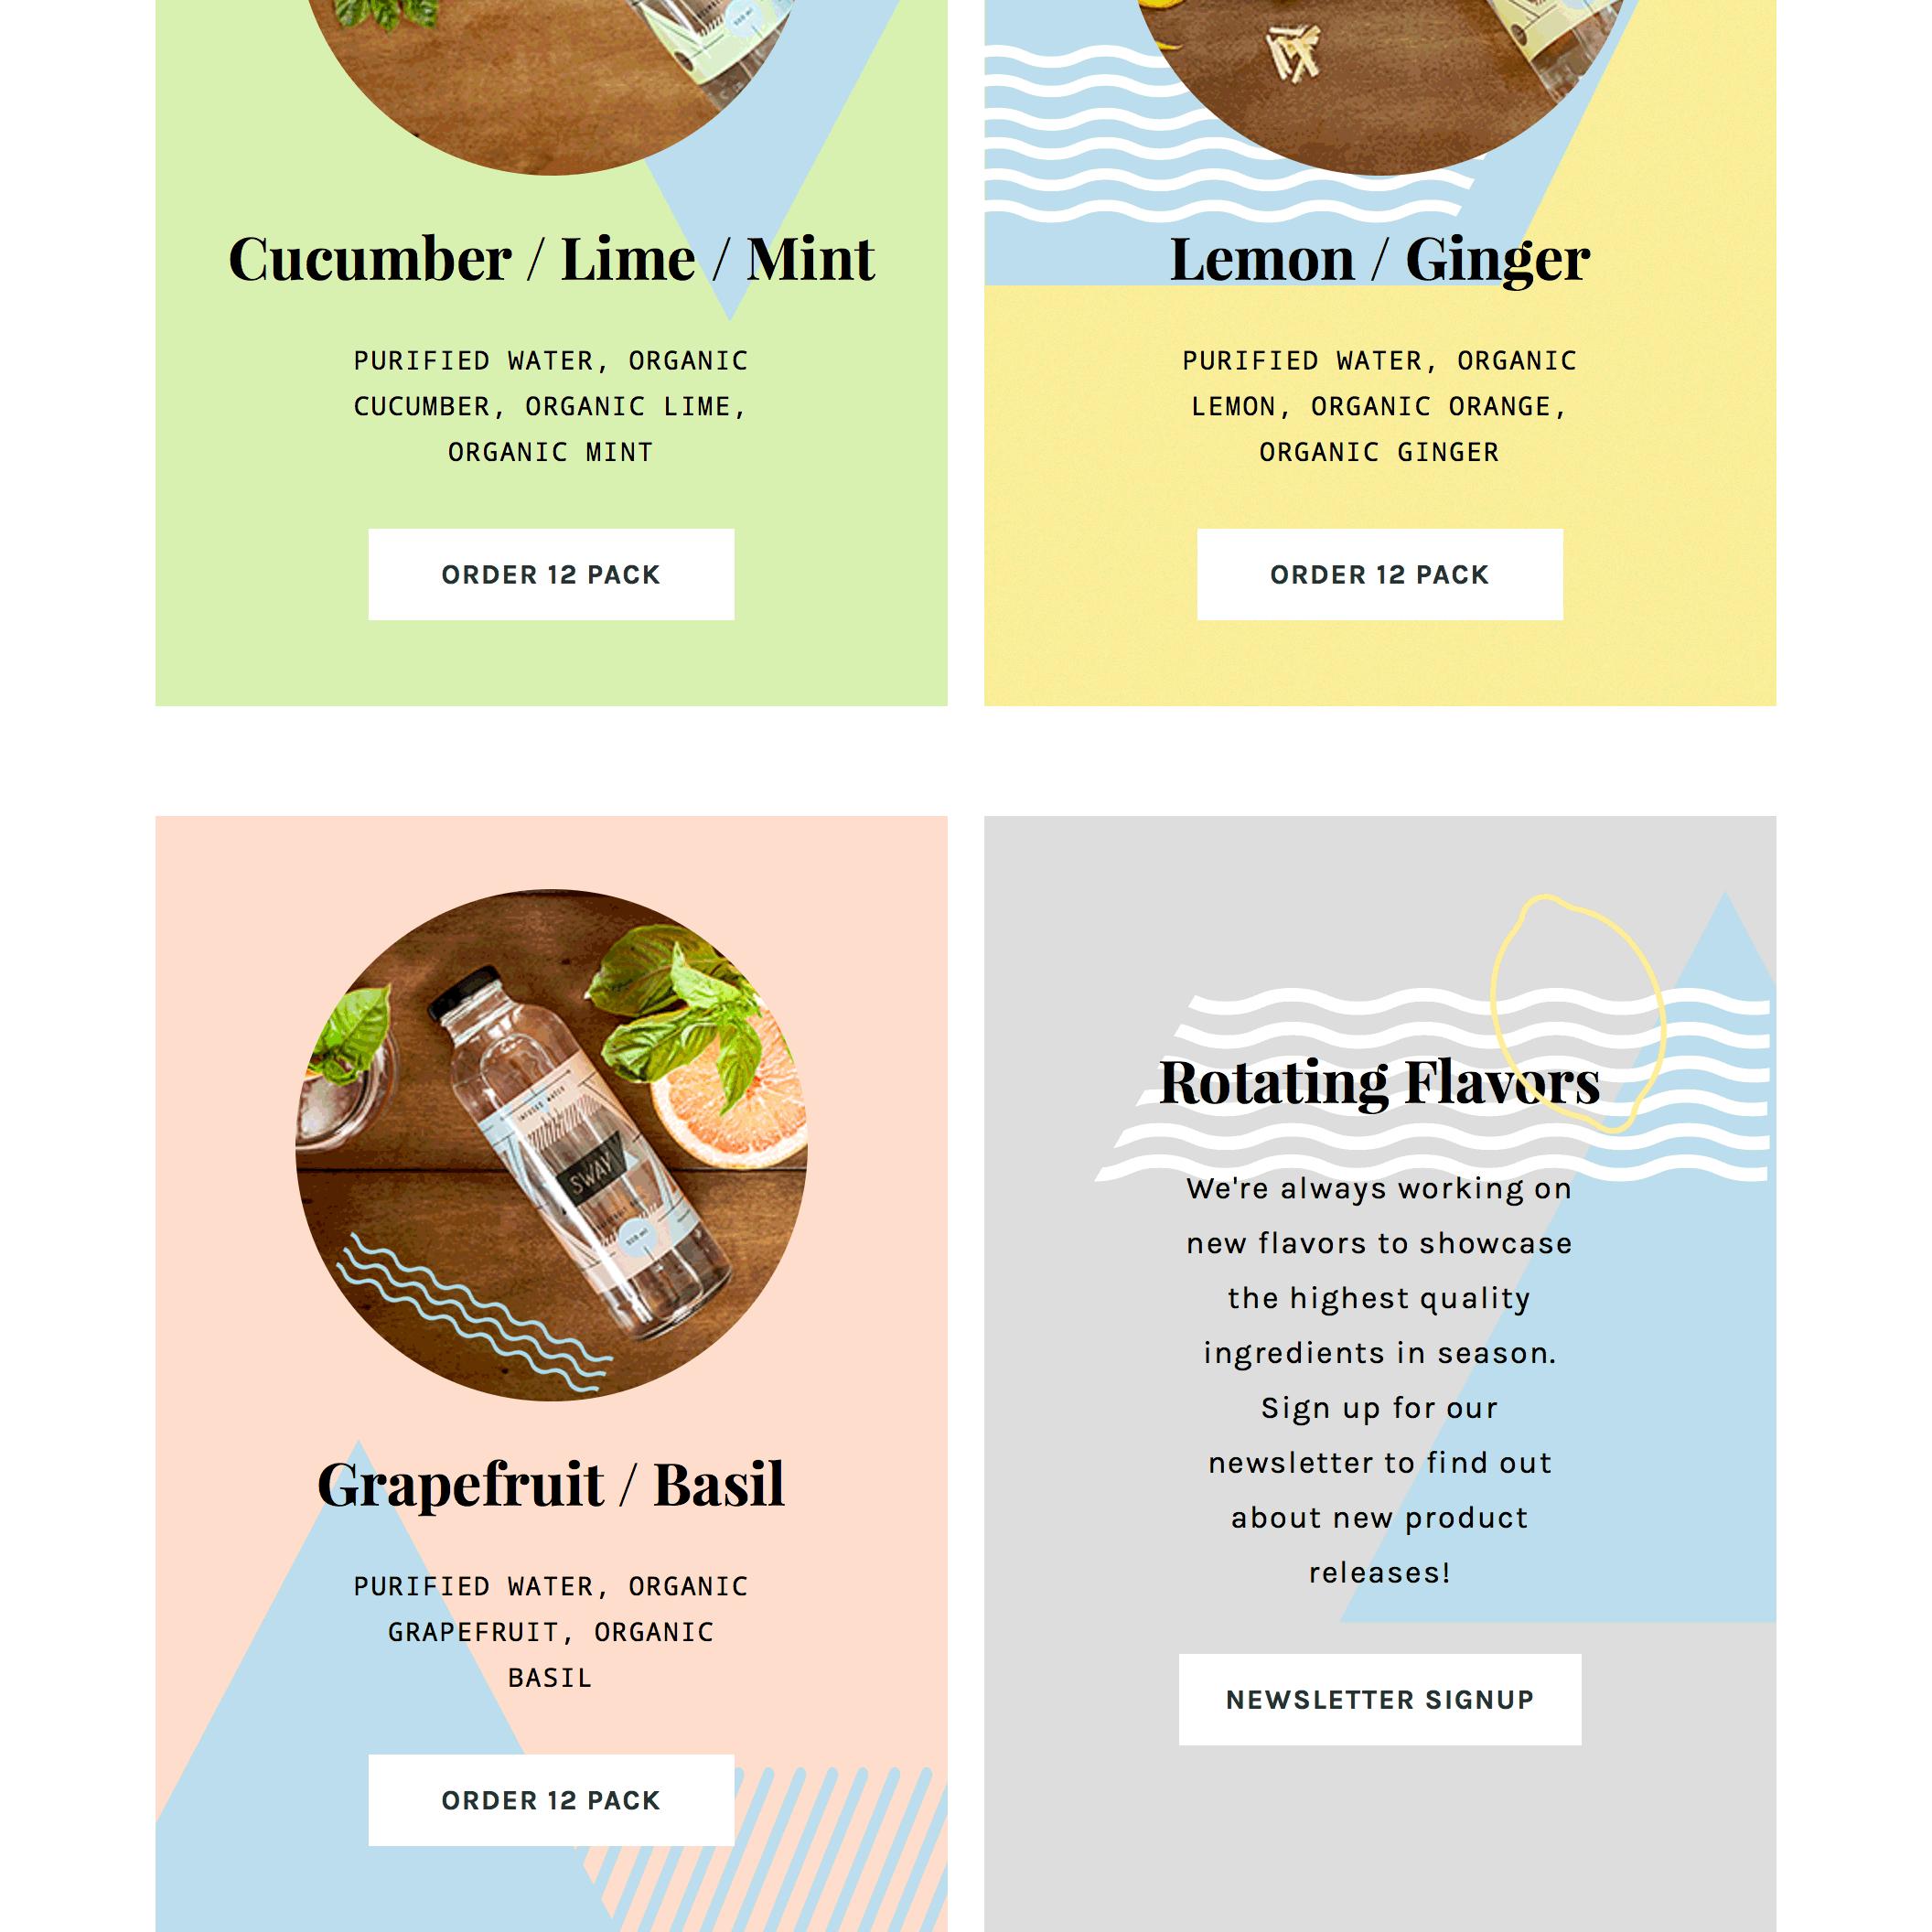 Fonts Used: Playfair Display, Droid Sans Mono, Karla, and